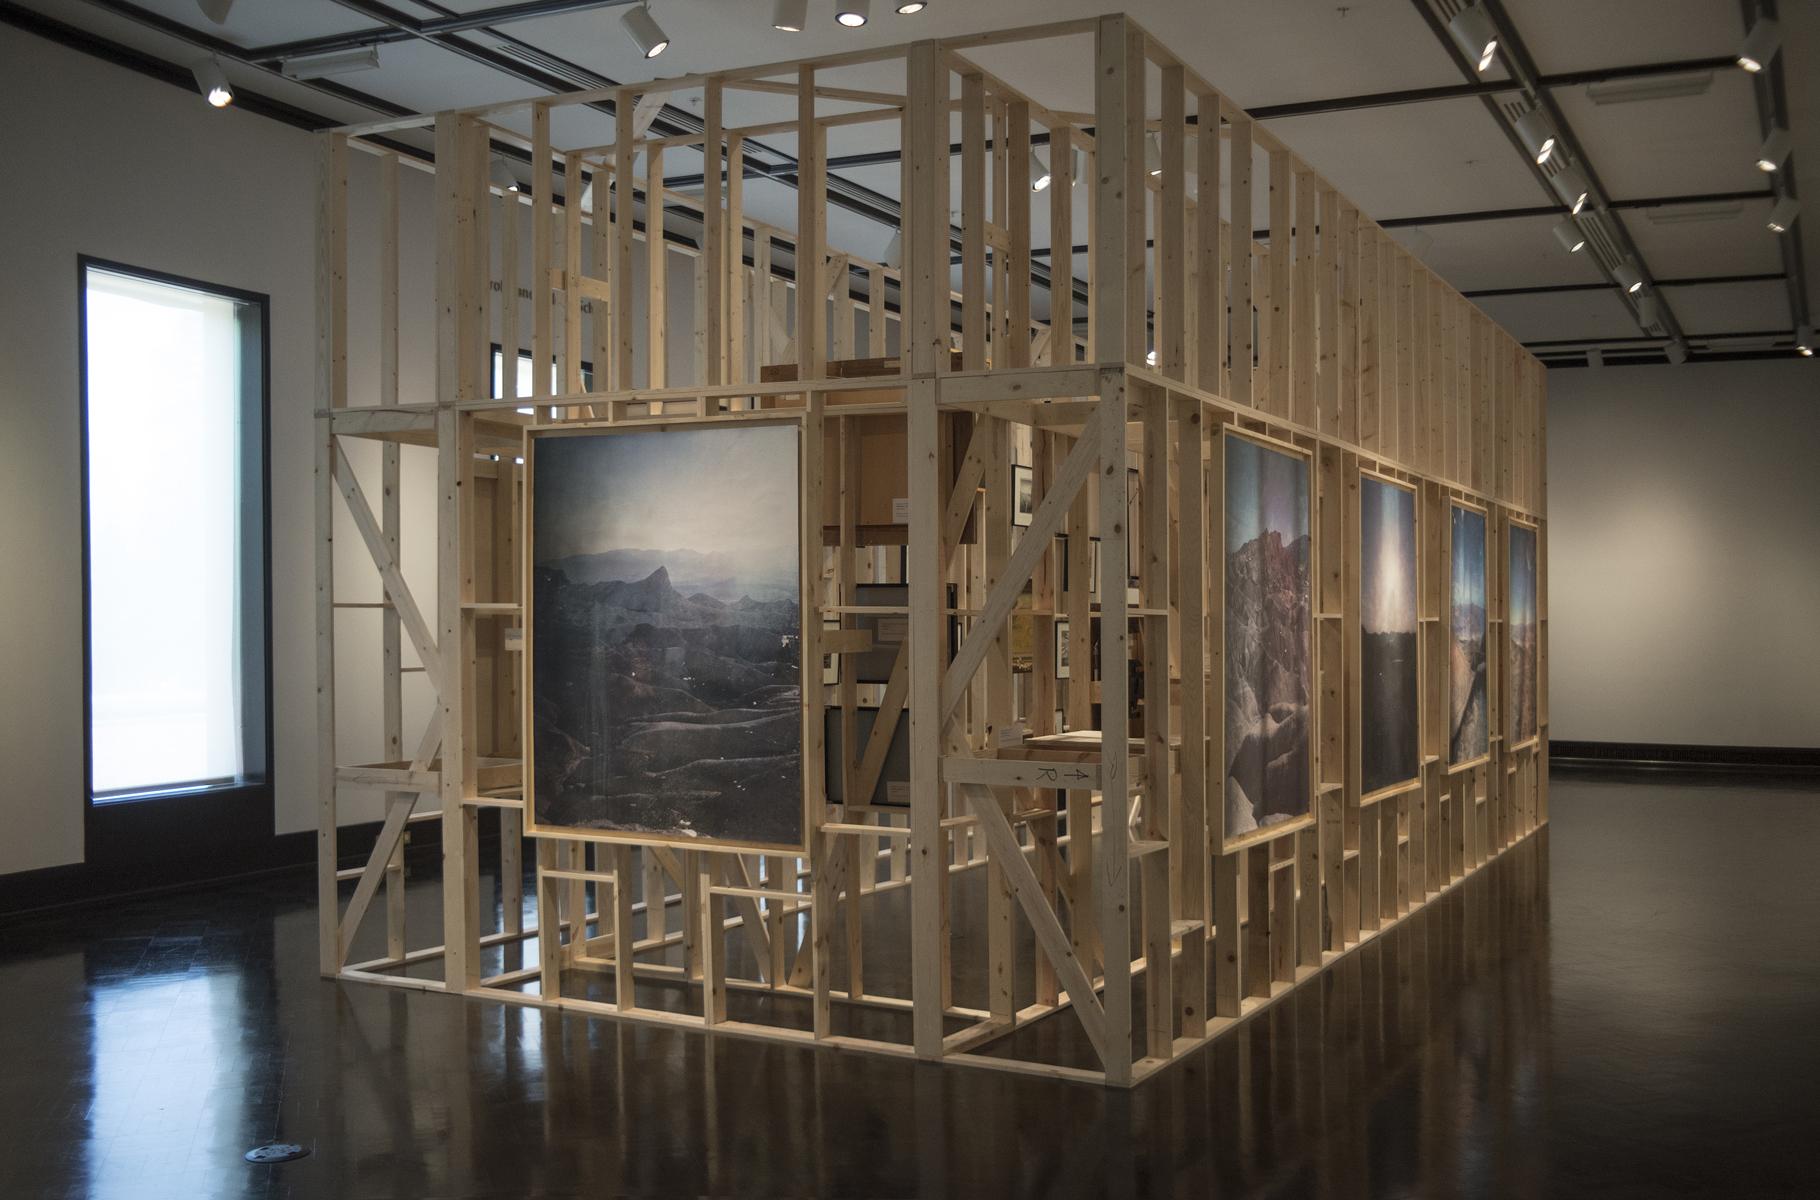 Rodrigo Valenzuela,installation view,  Work in its Place , Jordan Schnitzer Museum of Art, Eugene, OR. April 25, 2018-August 05, 2018.   Image courtesy of the artist.